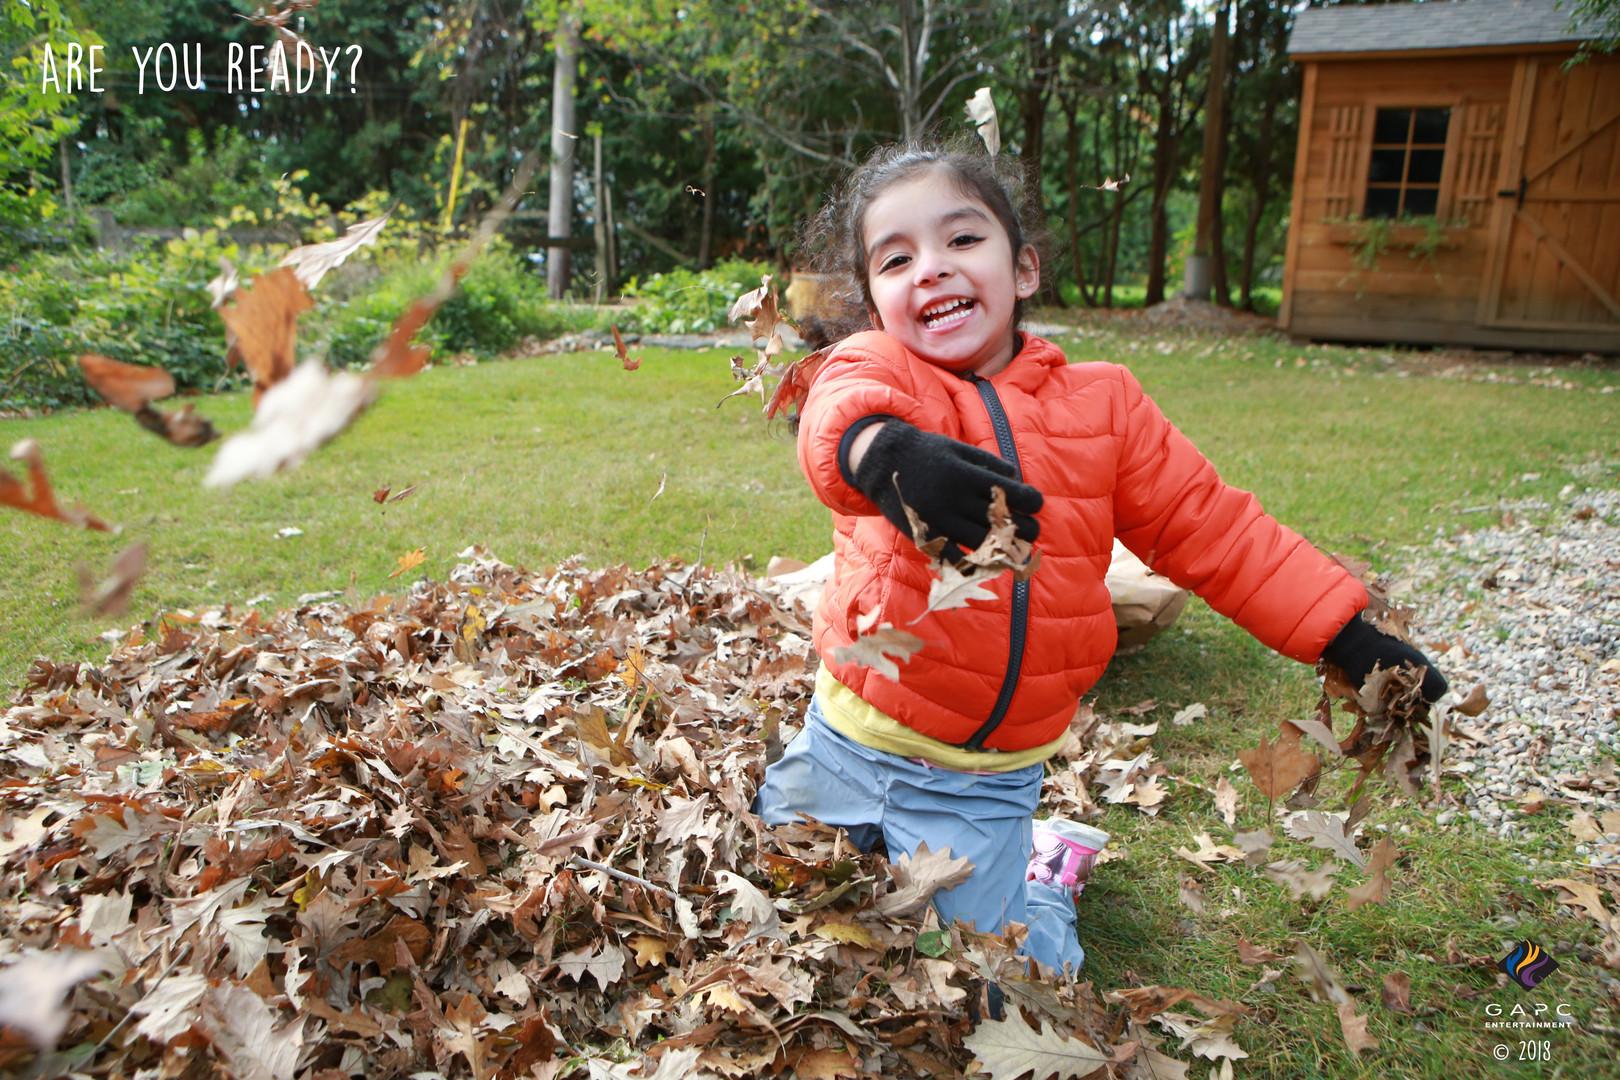 Alysha_Raking Leaves_Throwing Leaves.jpg